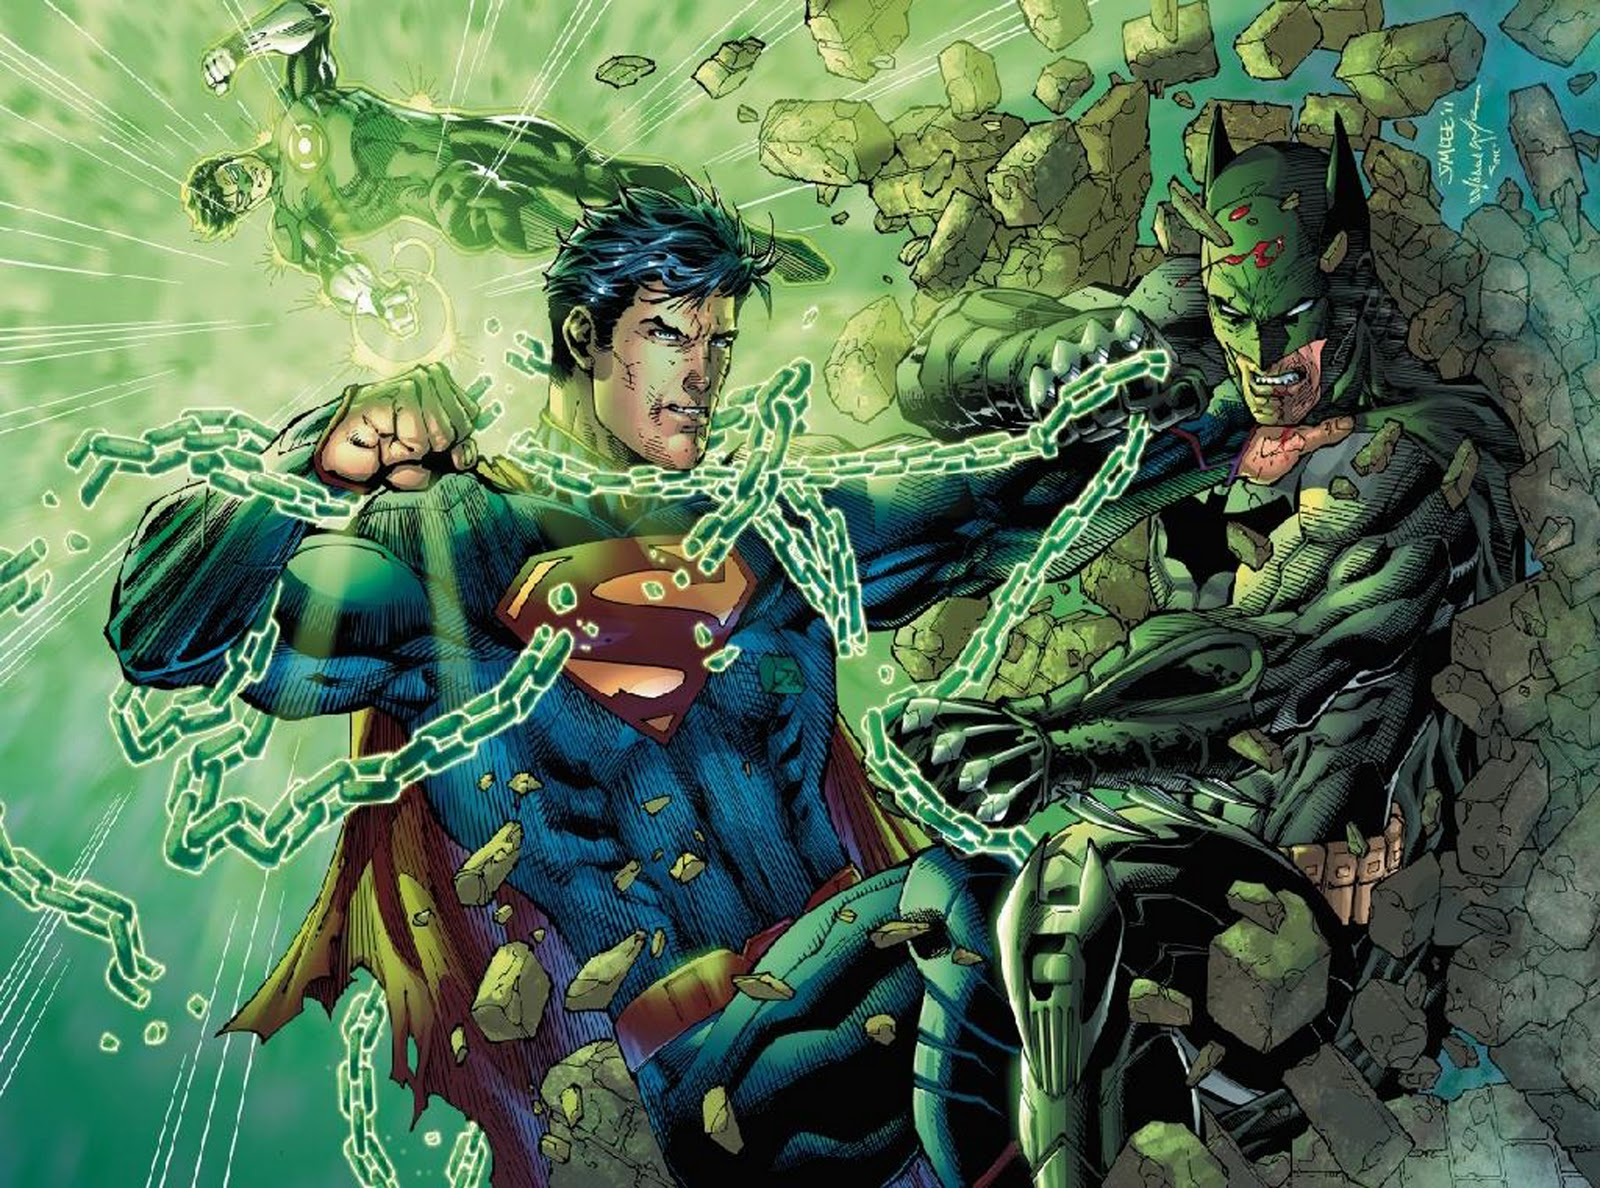 Superman vs green lantern - photo#9